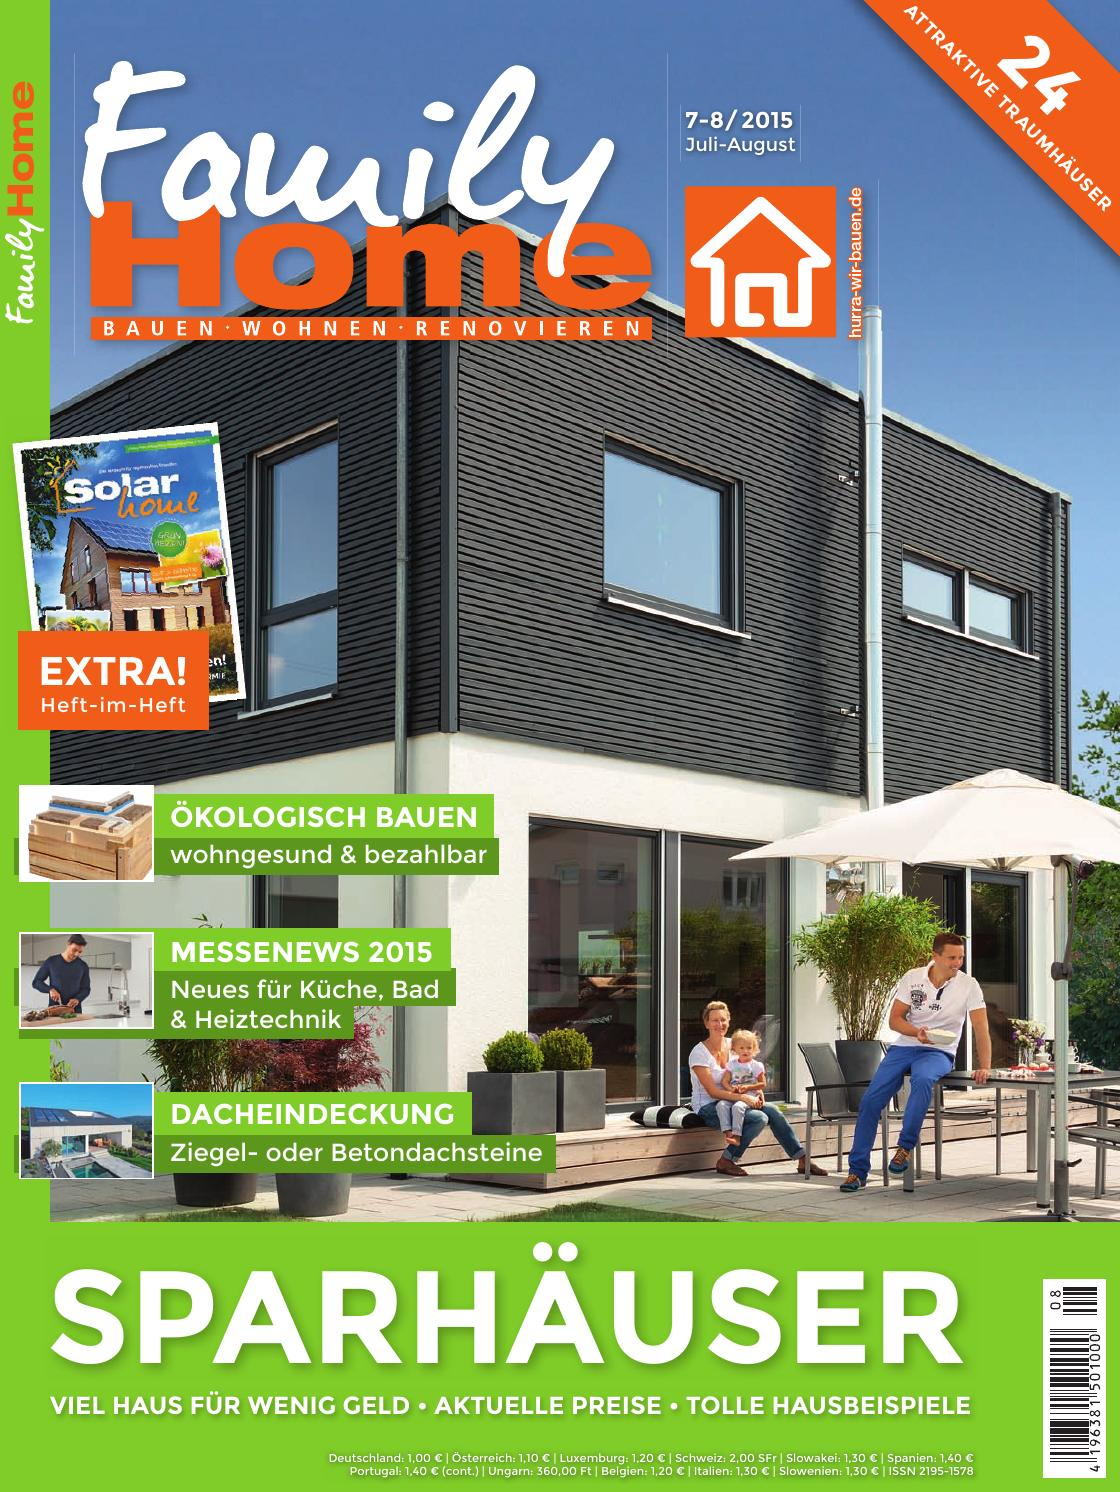 FamilyHome 7/8 2015 by Family Home Verlag GmbH - issuu